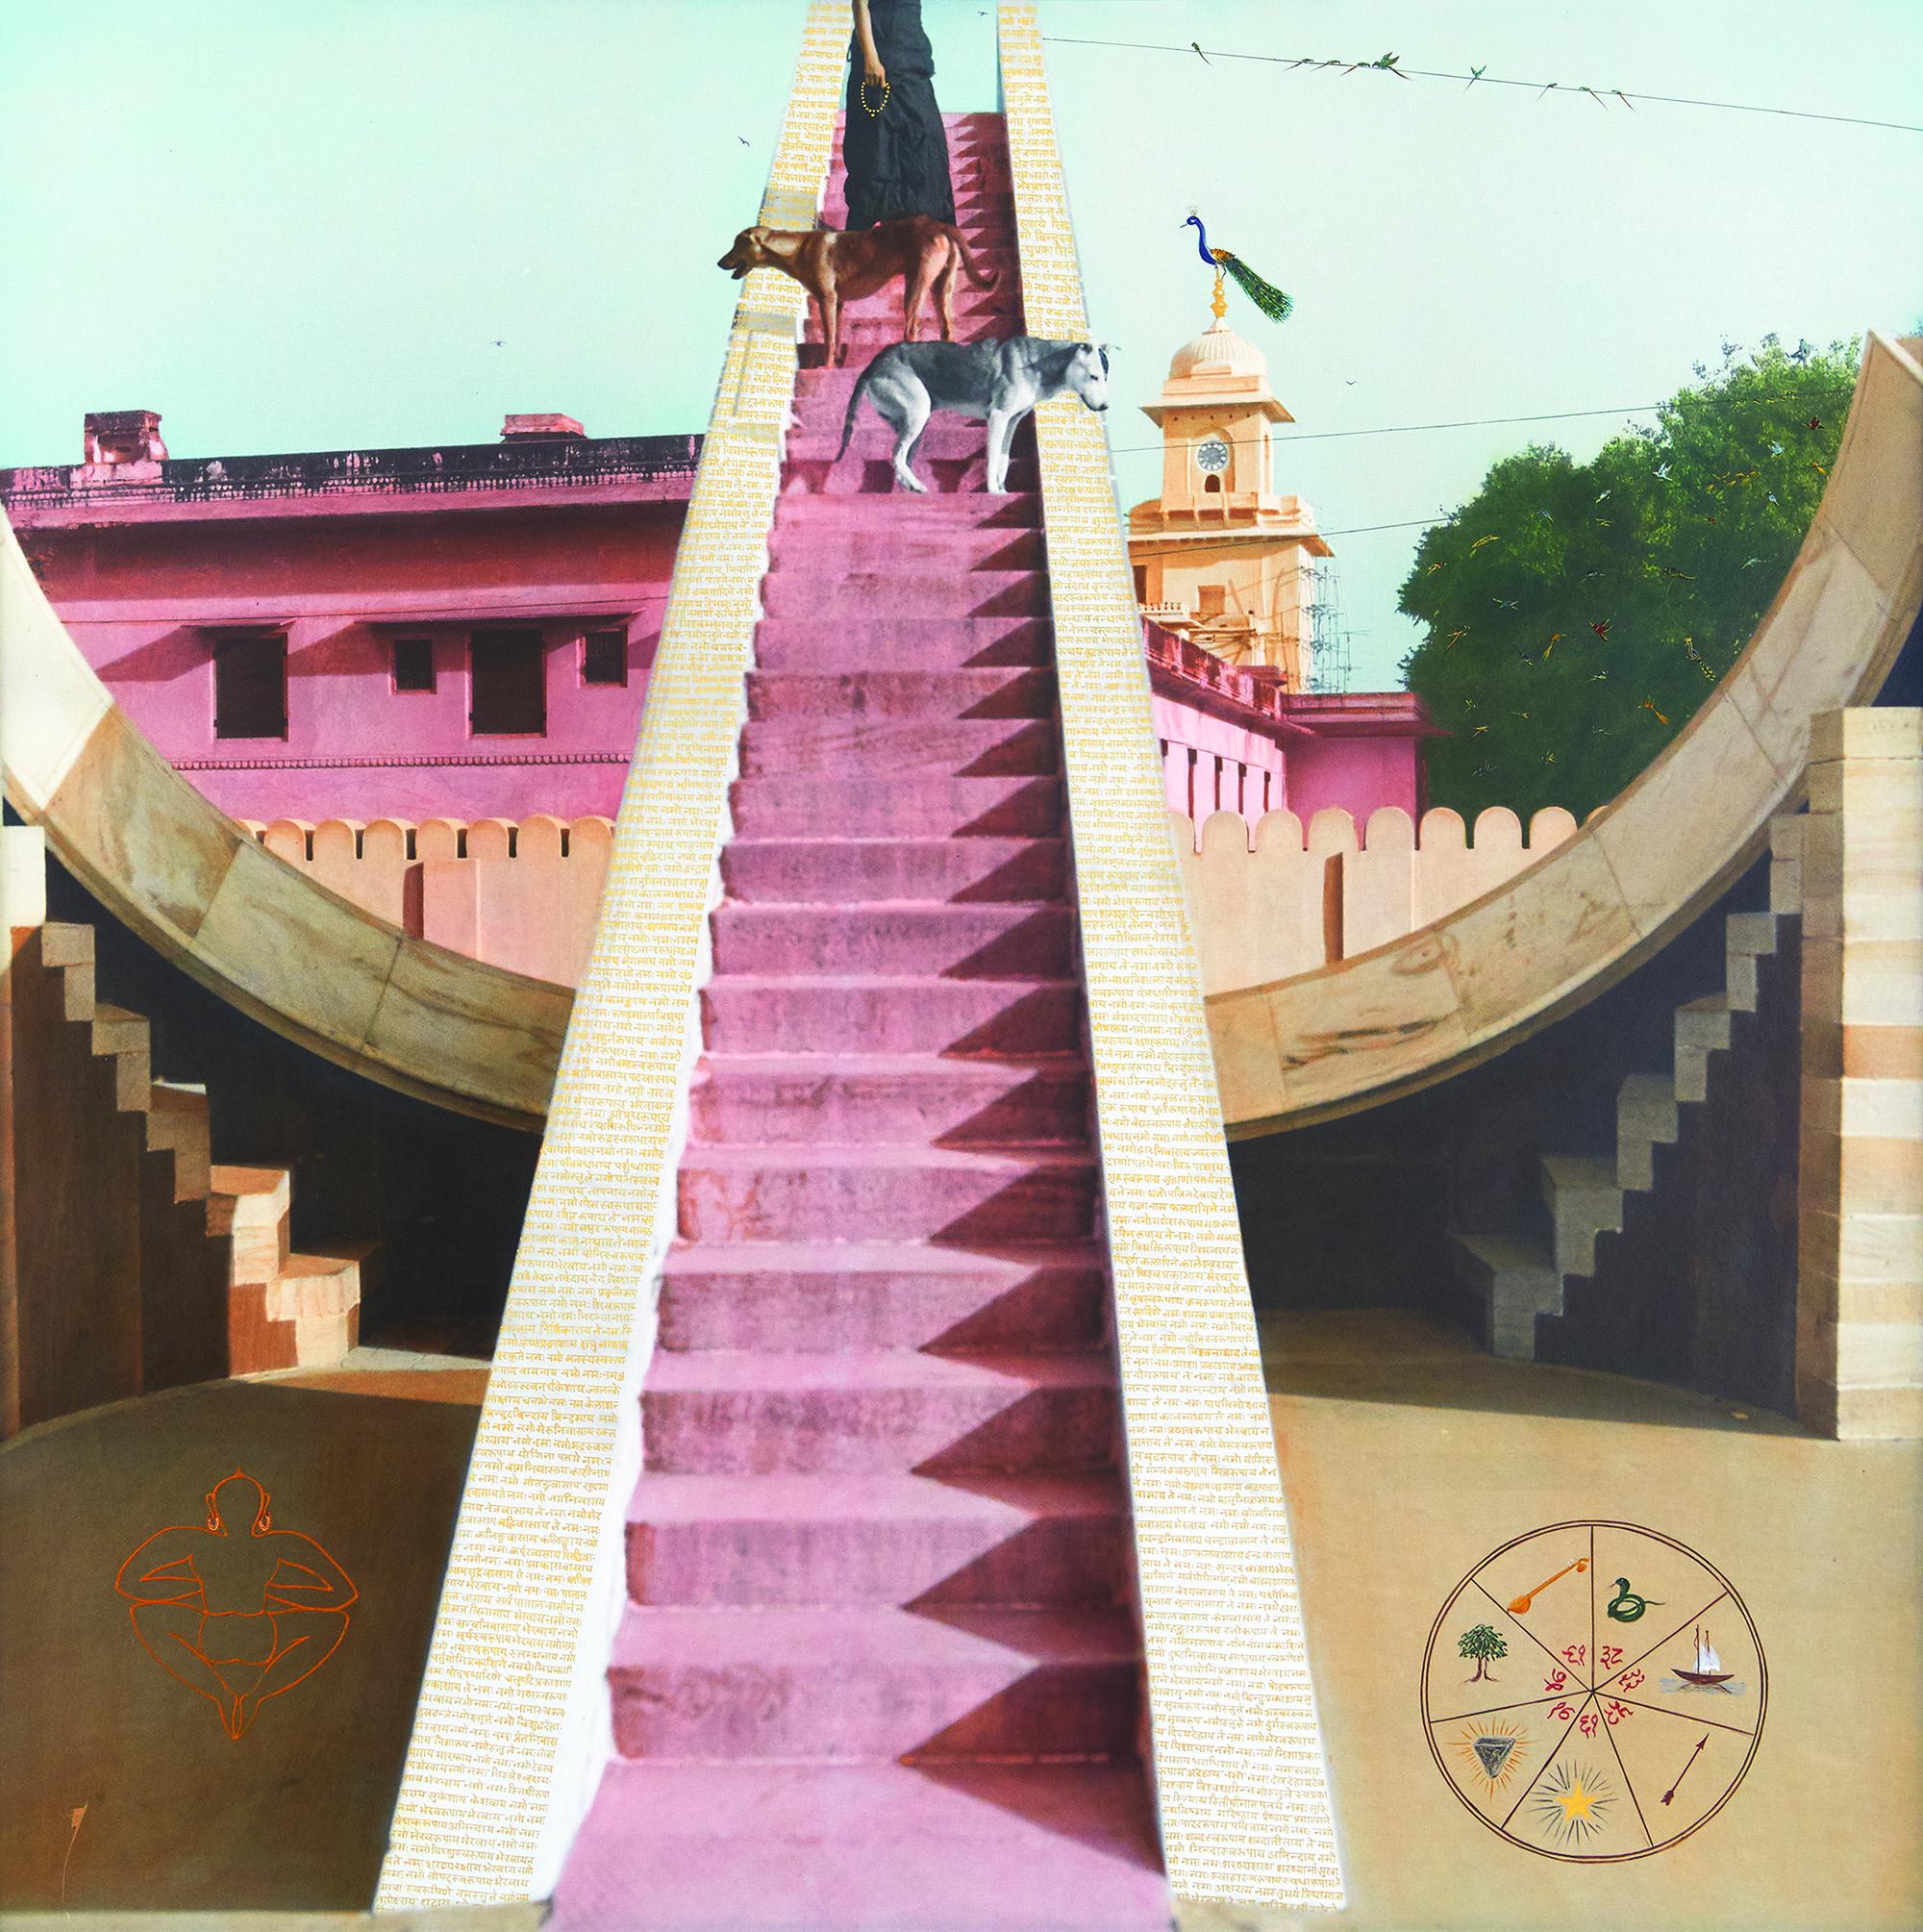 Pamela Singh, Tantric Self-Portrait in Jaipur #18 , 2000-2001